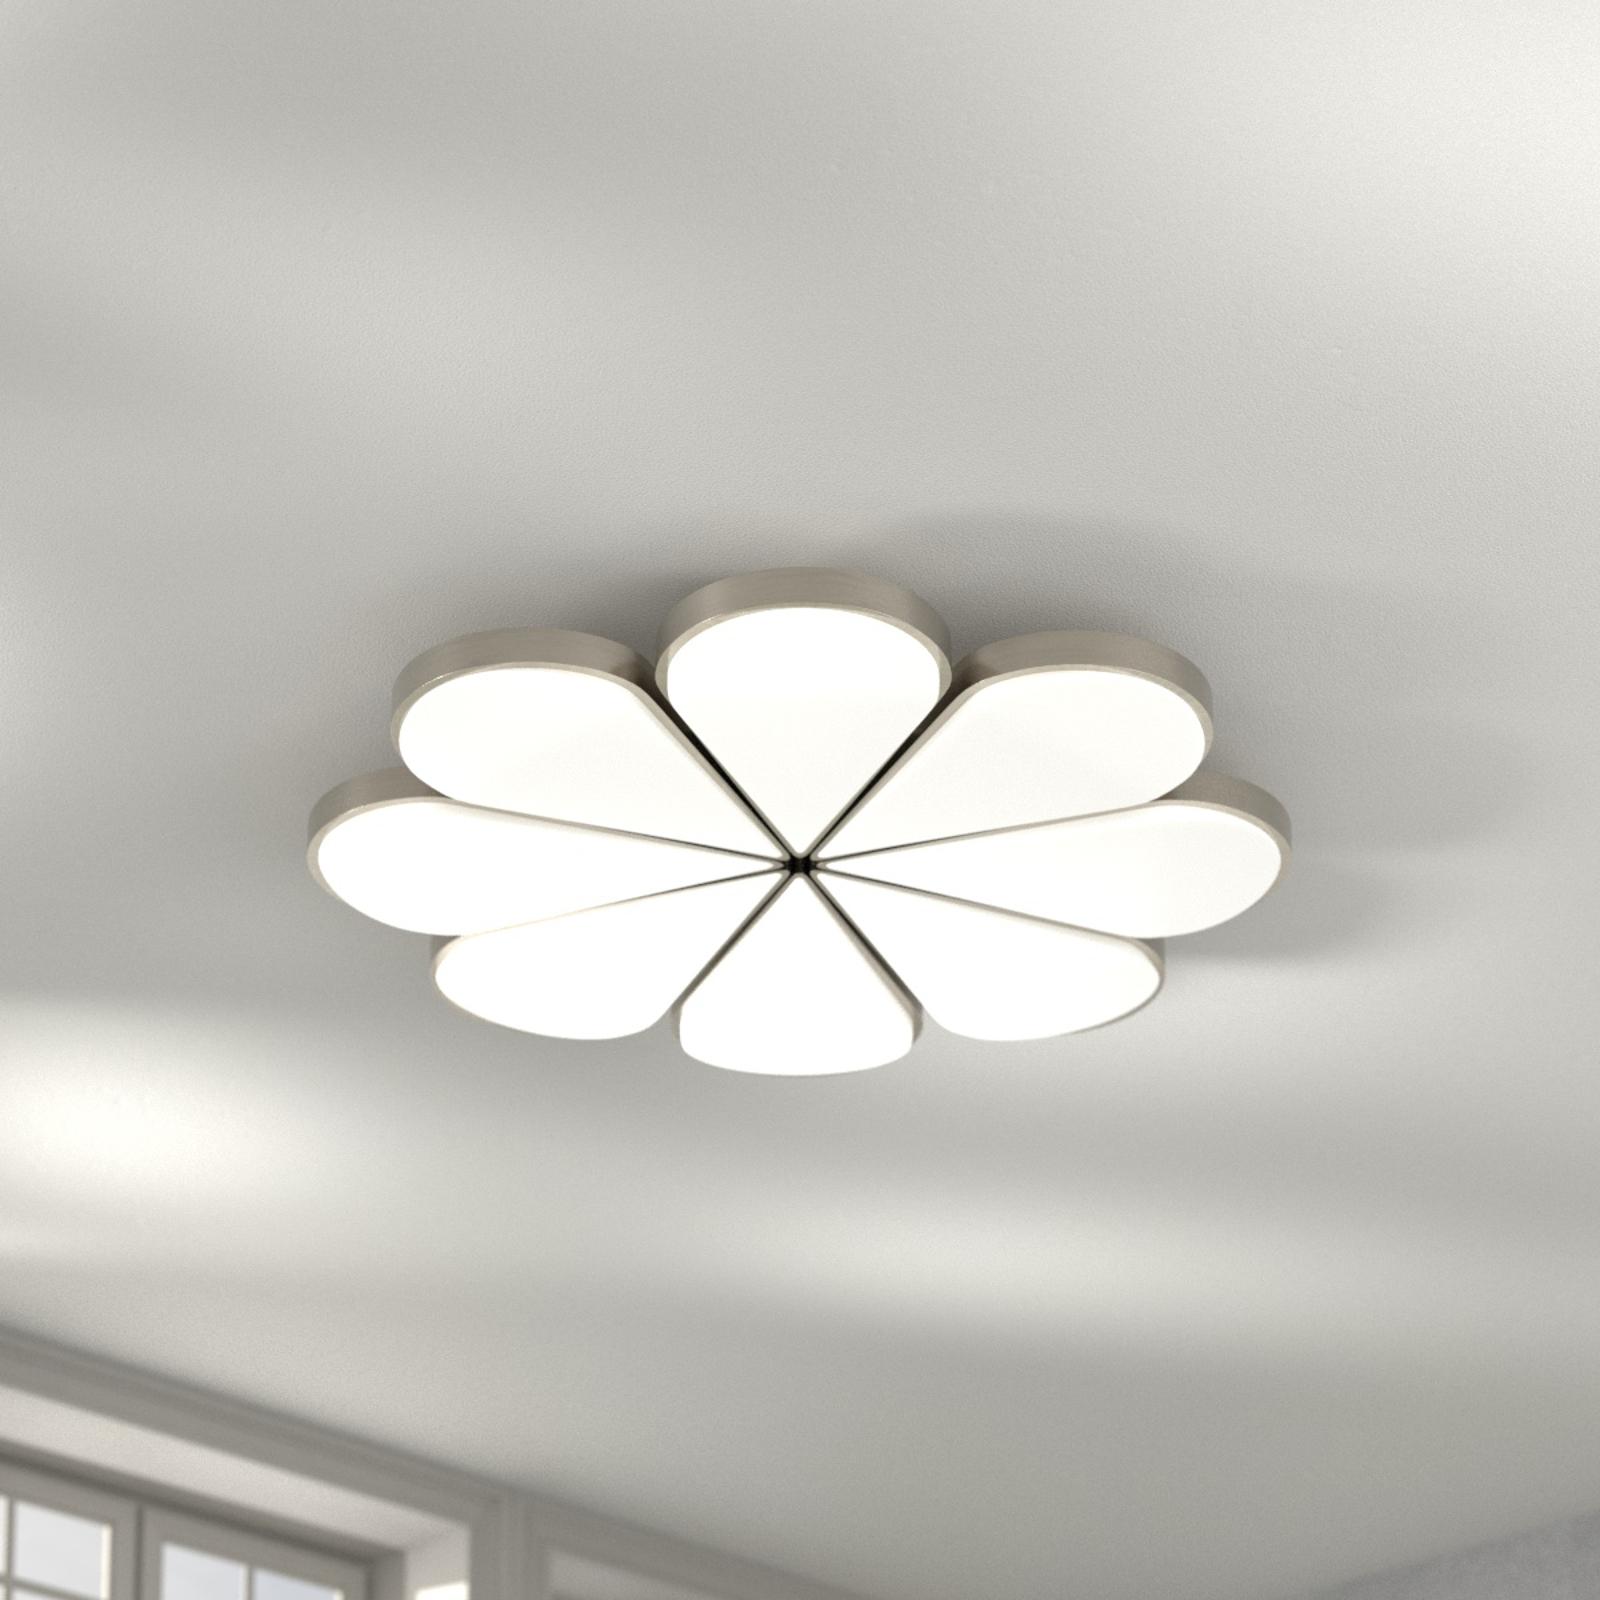 B-Leuchten Flower LED plafondlamp CCT